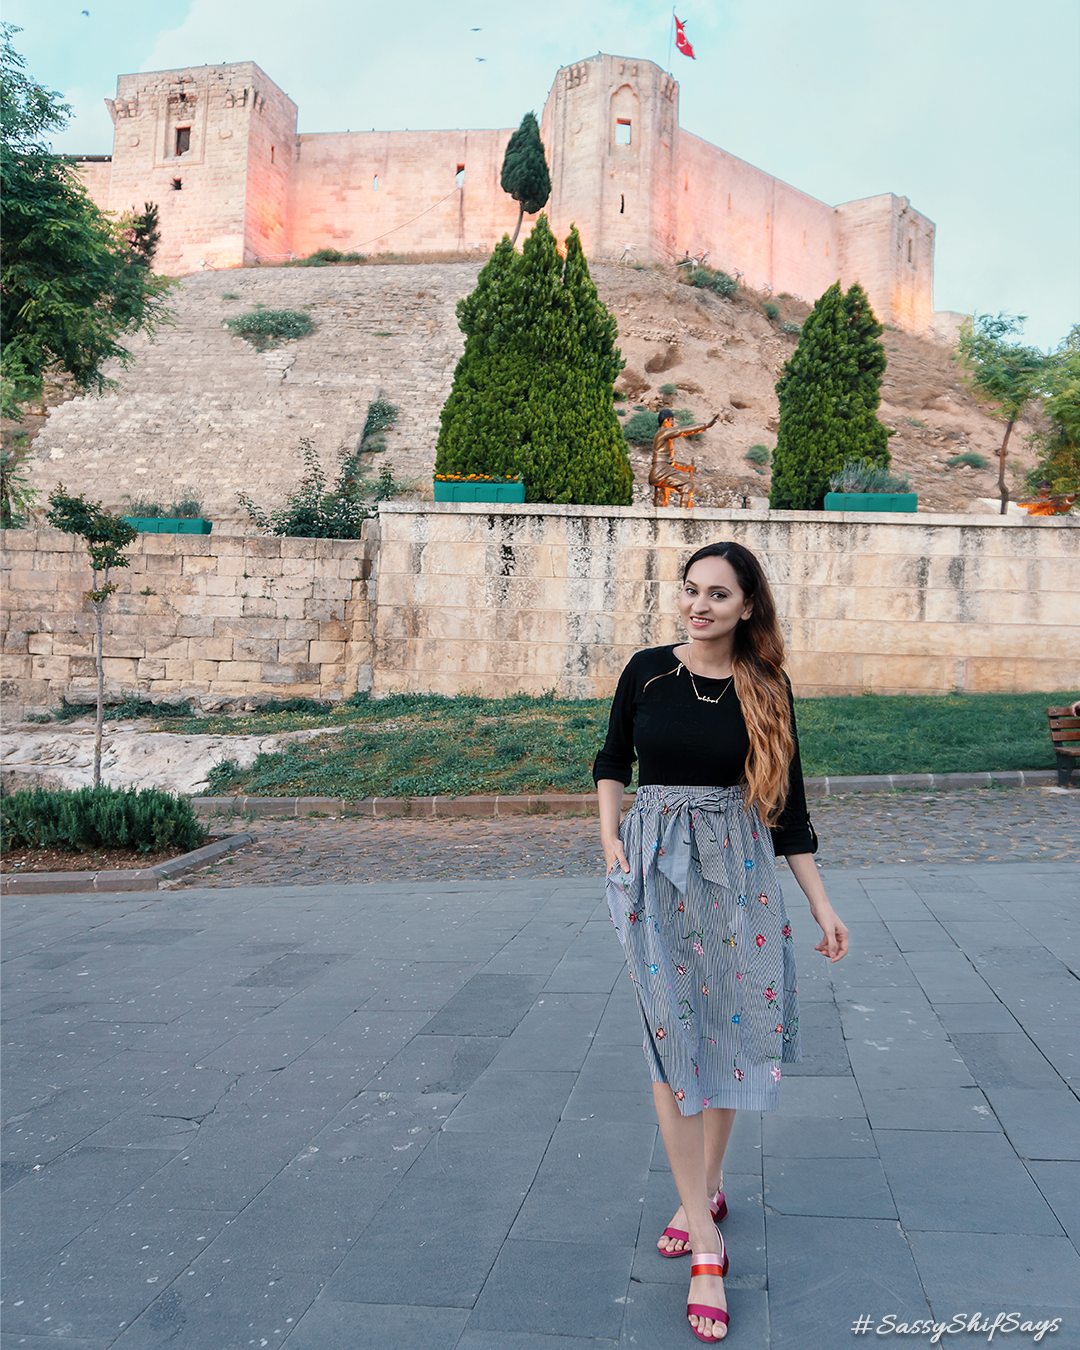 Photo of Gaziantep By Sassy Shif Says